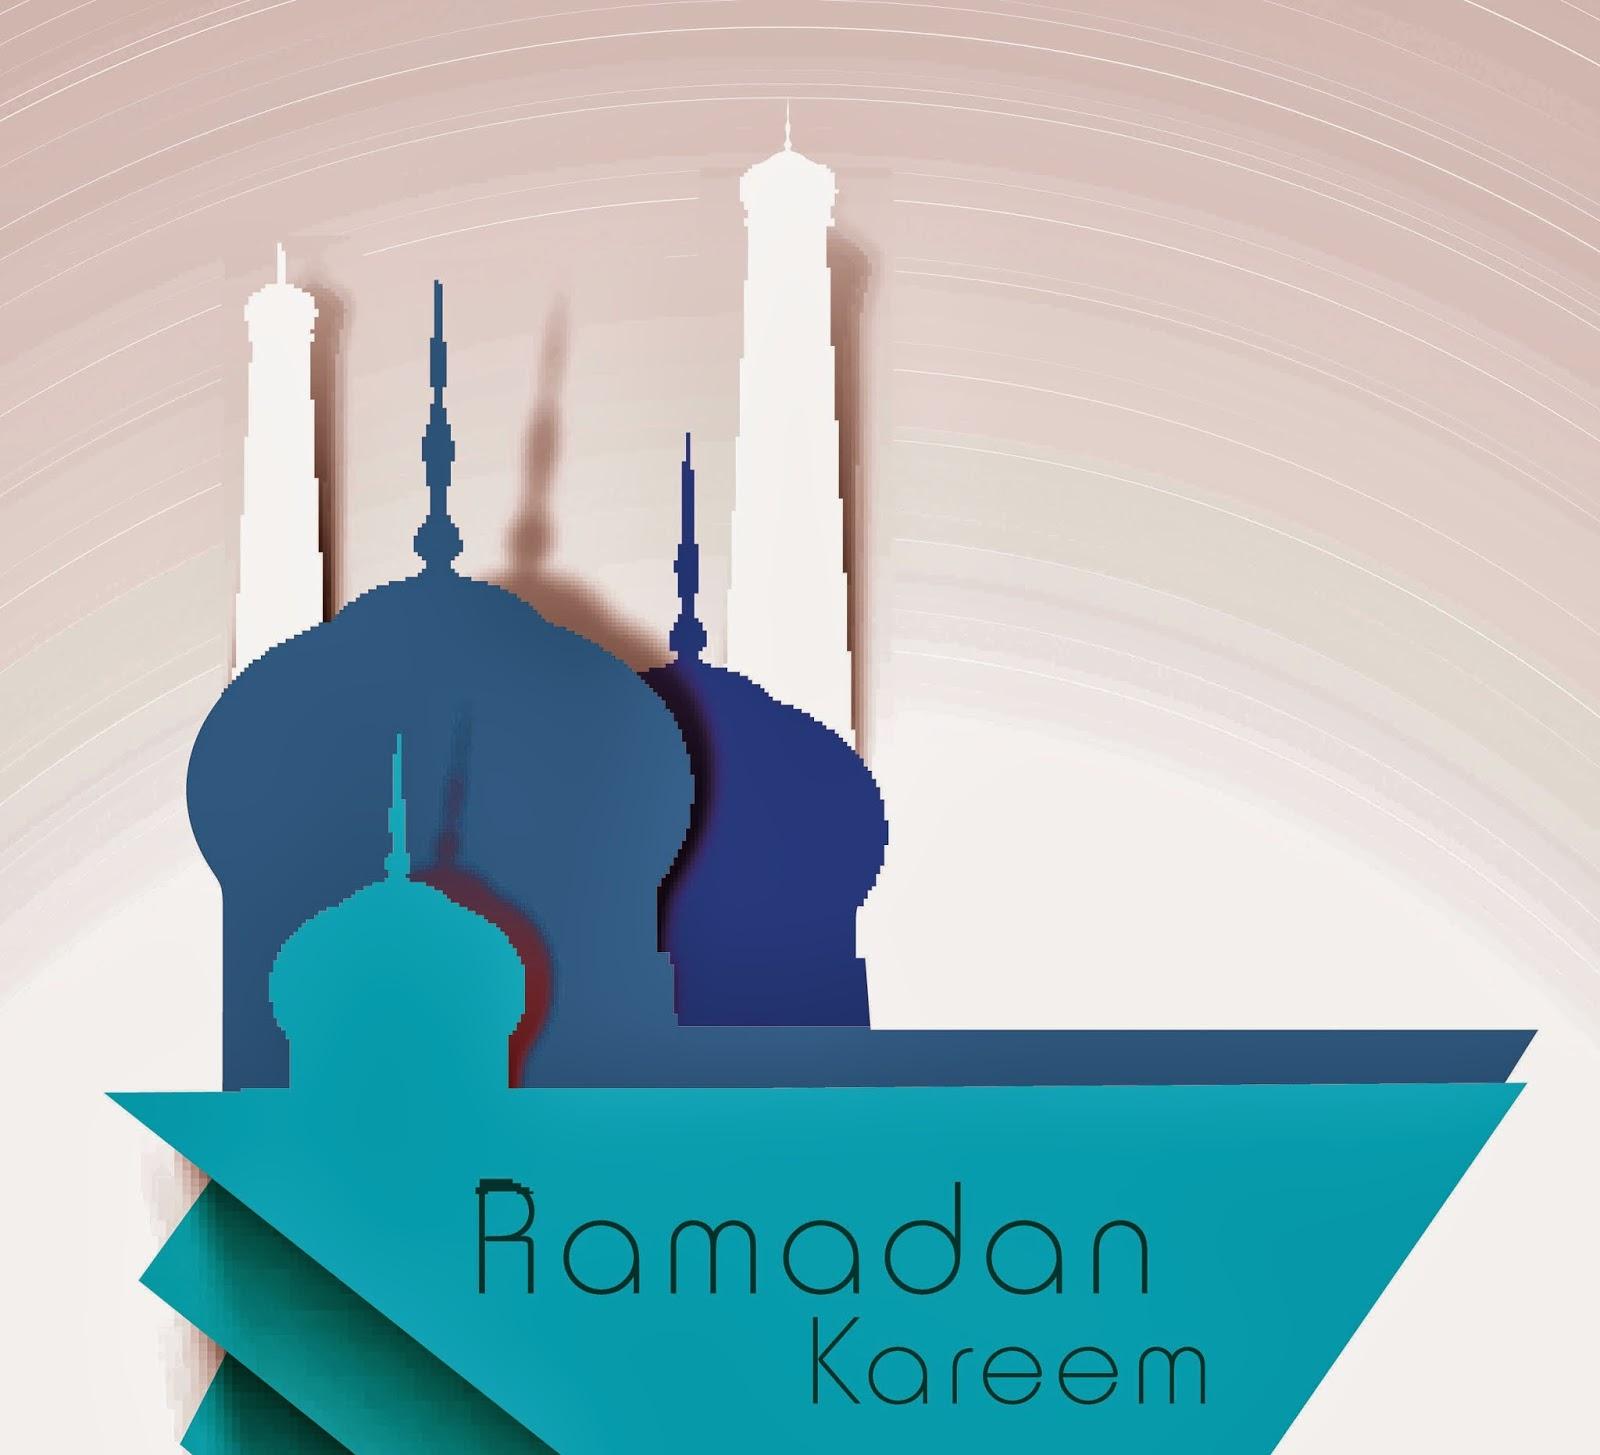 Decoration clipart ramadan Free Arabic kareem vector calligraphy